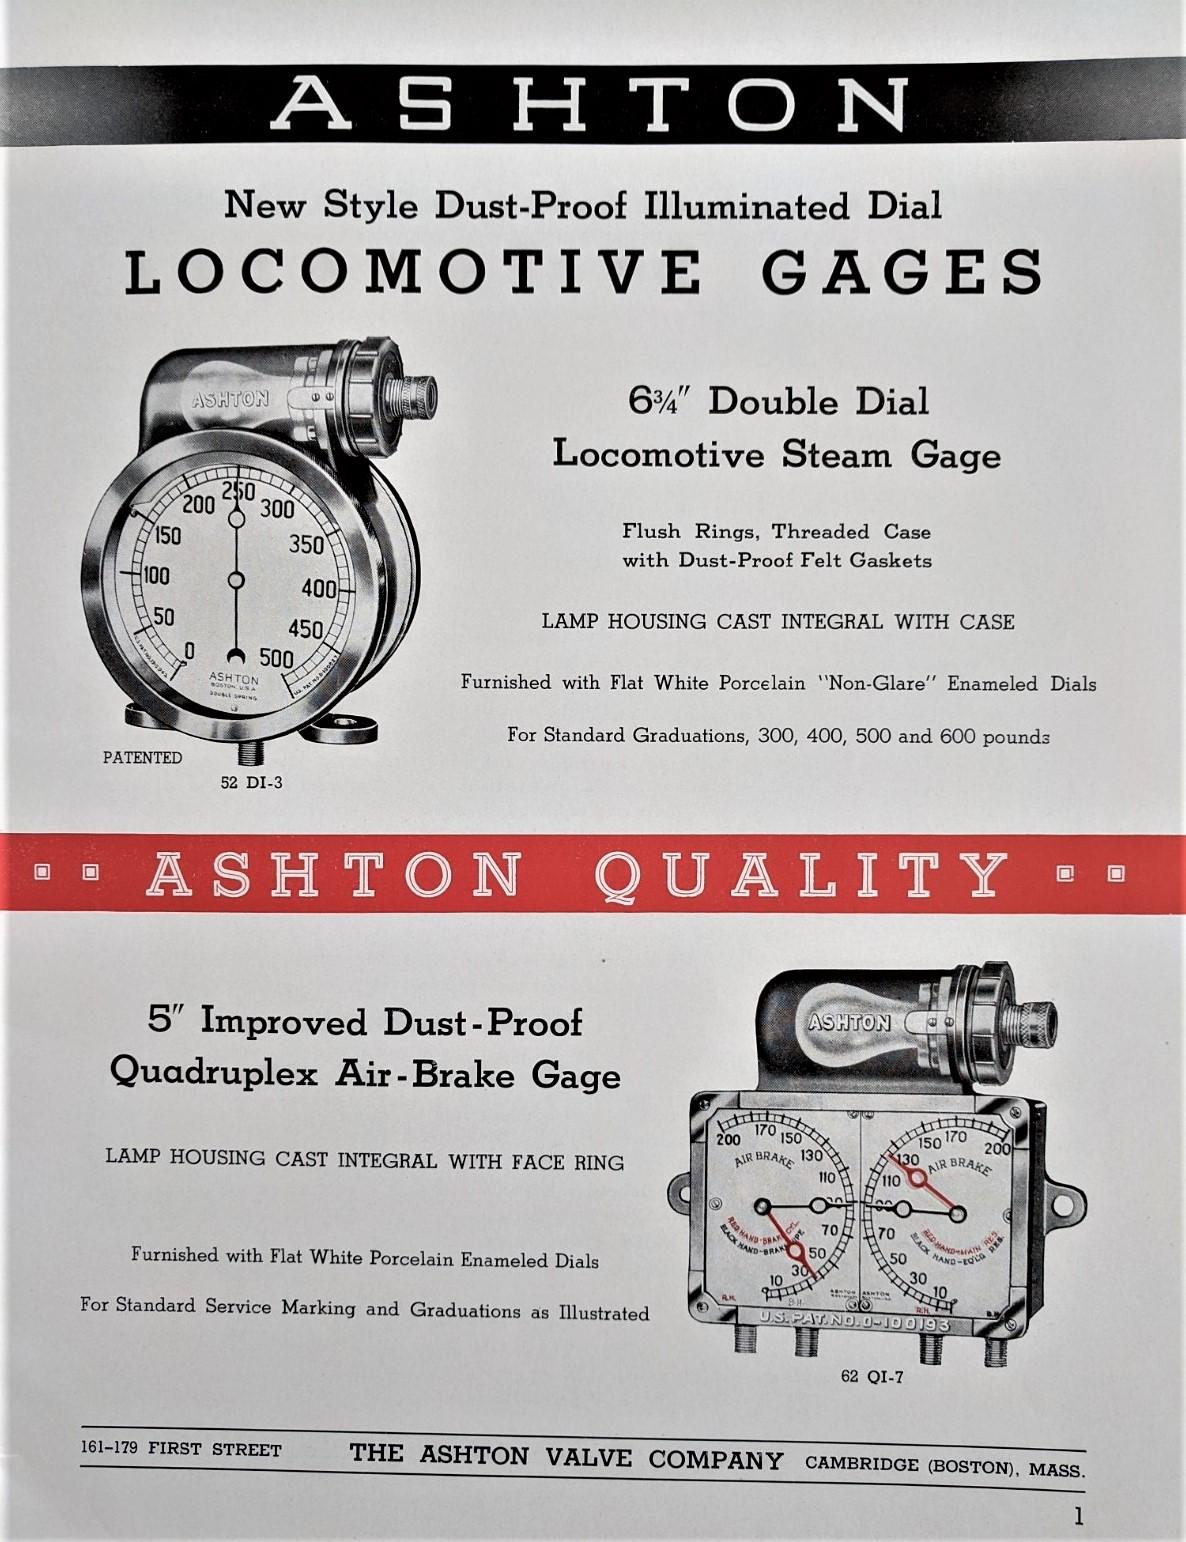 Ashton gage catalog 1941    1D.jpg